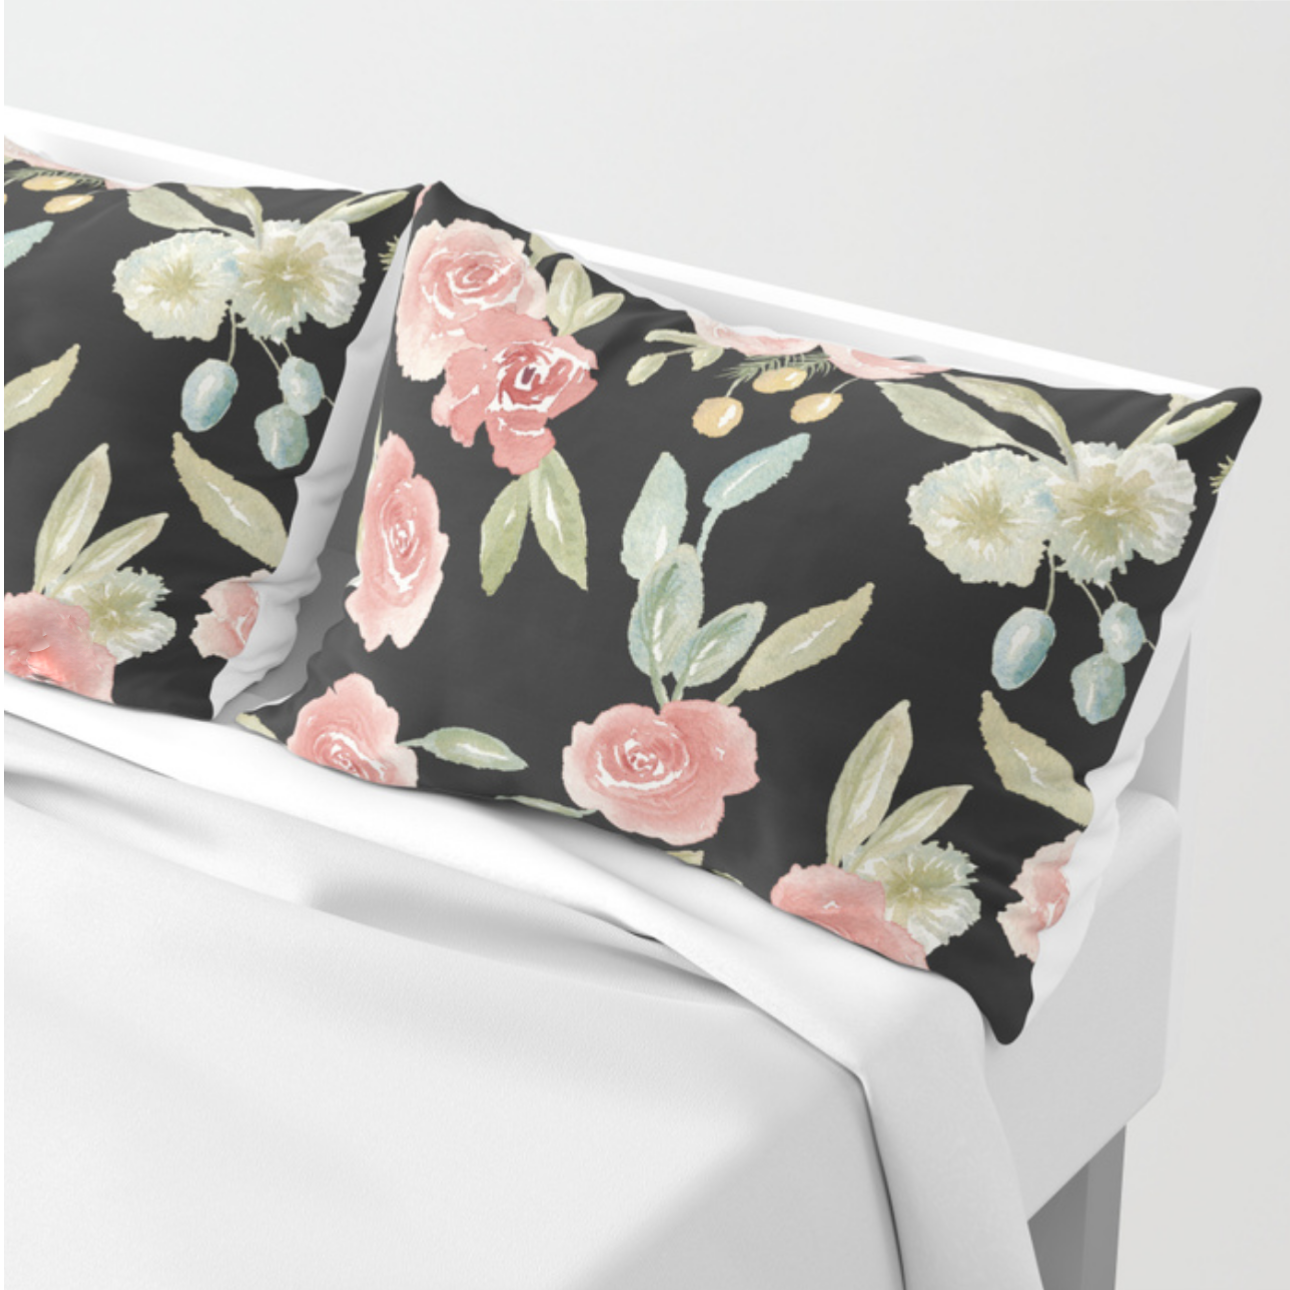 Loose Watercolor Floral Pillows Black